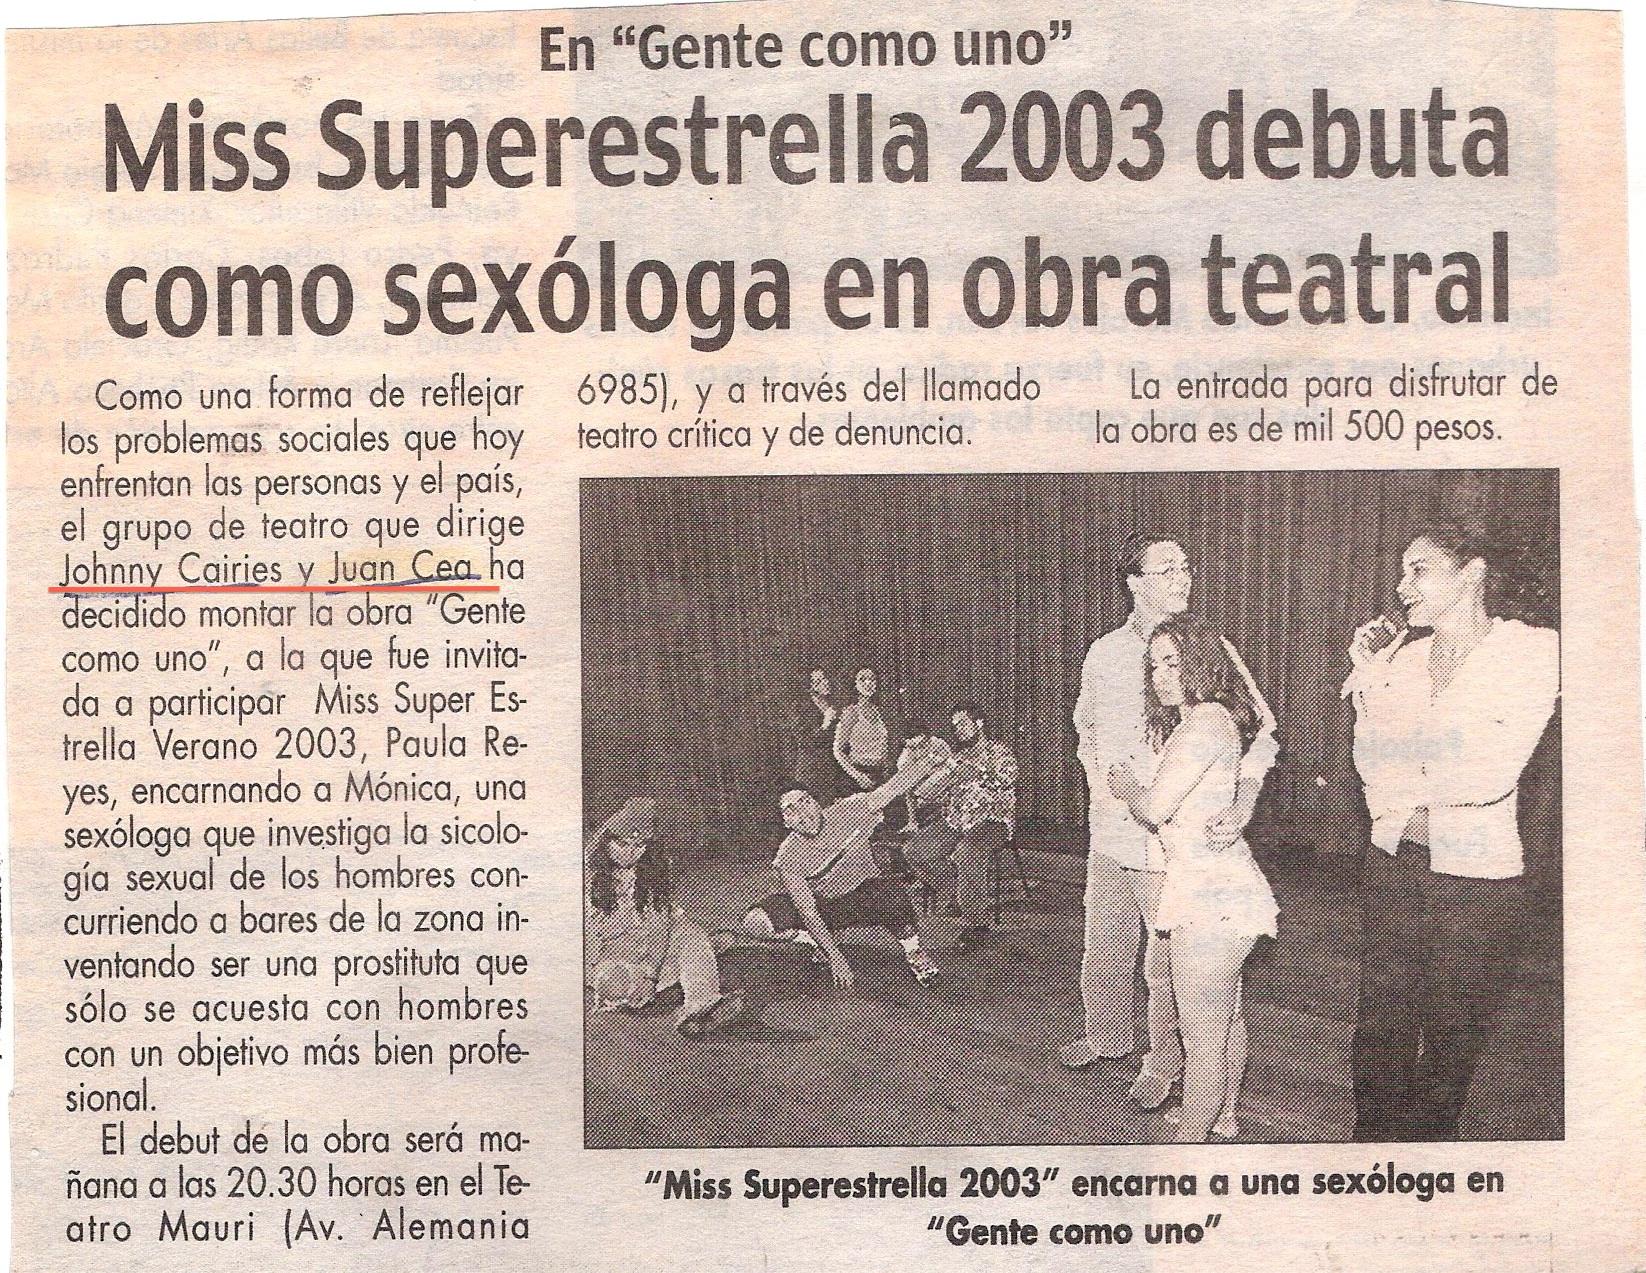 LA ESTRELLA  | Mars 2003